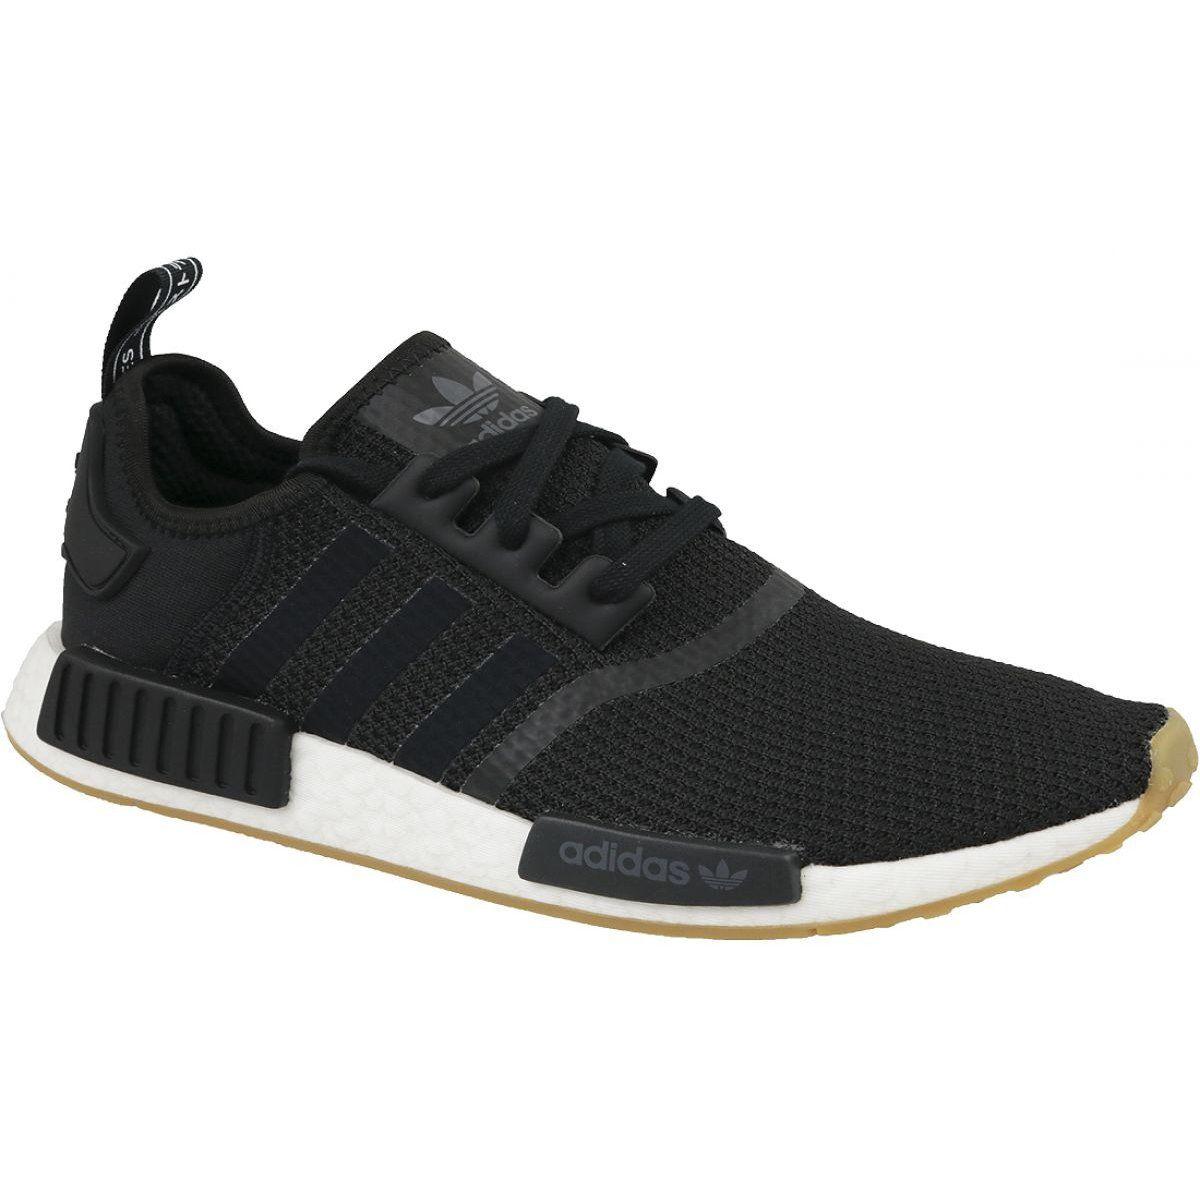 Buty Adidas Originals Nmd R1 M B42200 Czarne Adidas Shoes Originals Shoes Sneakers Adidas Adidas